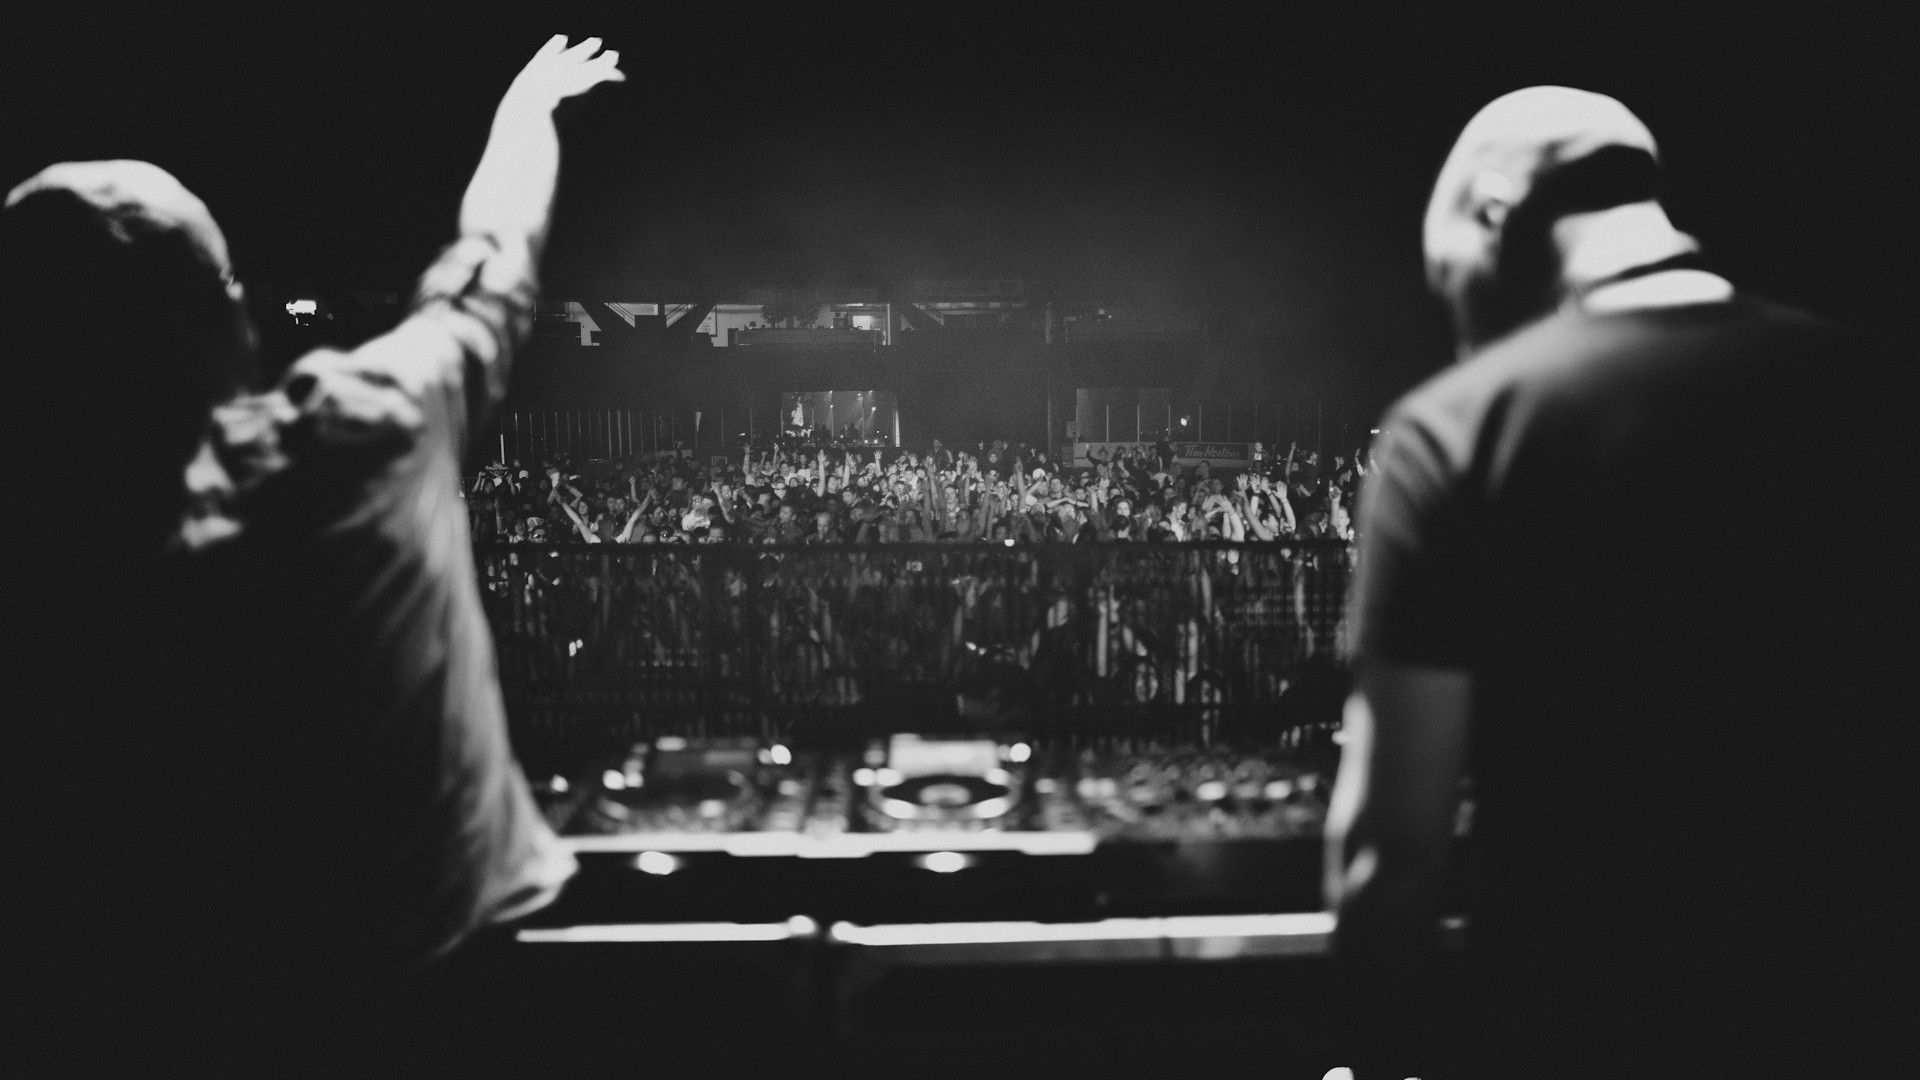 Wallpapers DJ Group (74+)